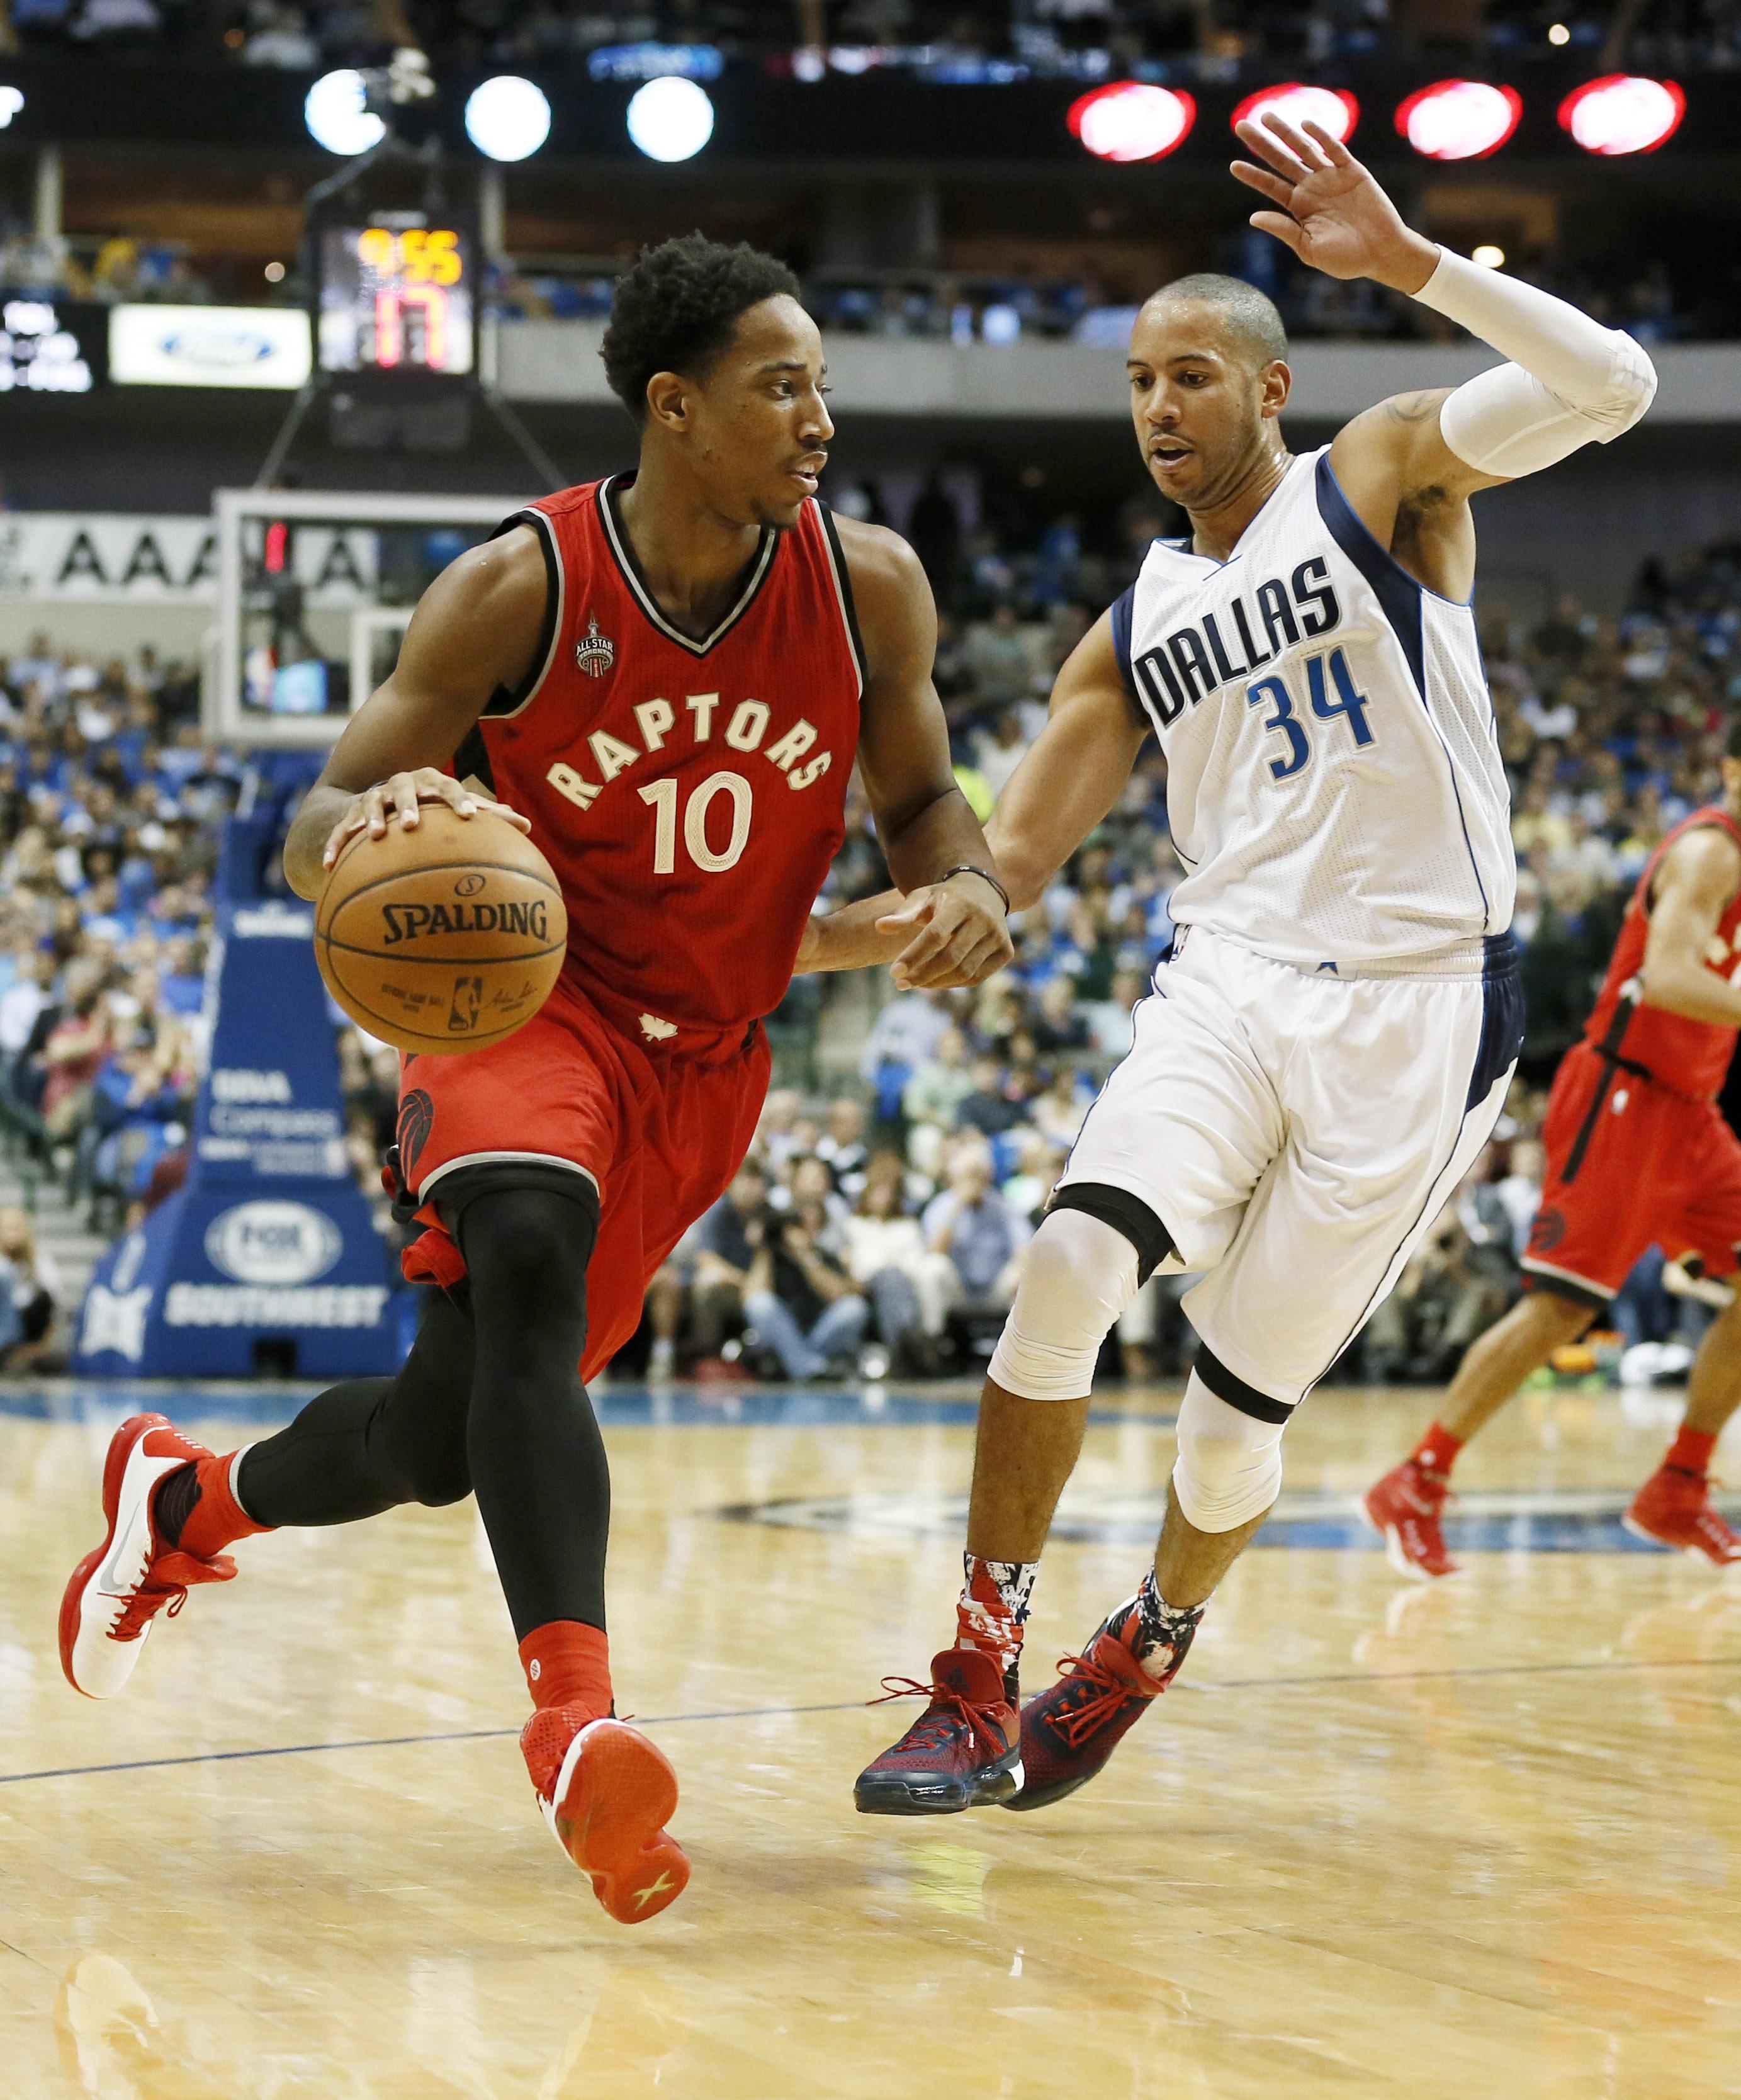 Toronto Raptors' DeMar DeRozan (10) moves the ball up court against Dallas Mavericks' Devin Harris (34) in the first half of an NBA basketball game Tuesday, Nov. 3, 2015, in Dallas.(AP Photo/Tony Gutierrez)